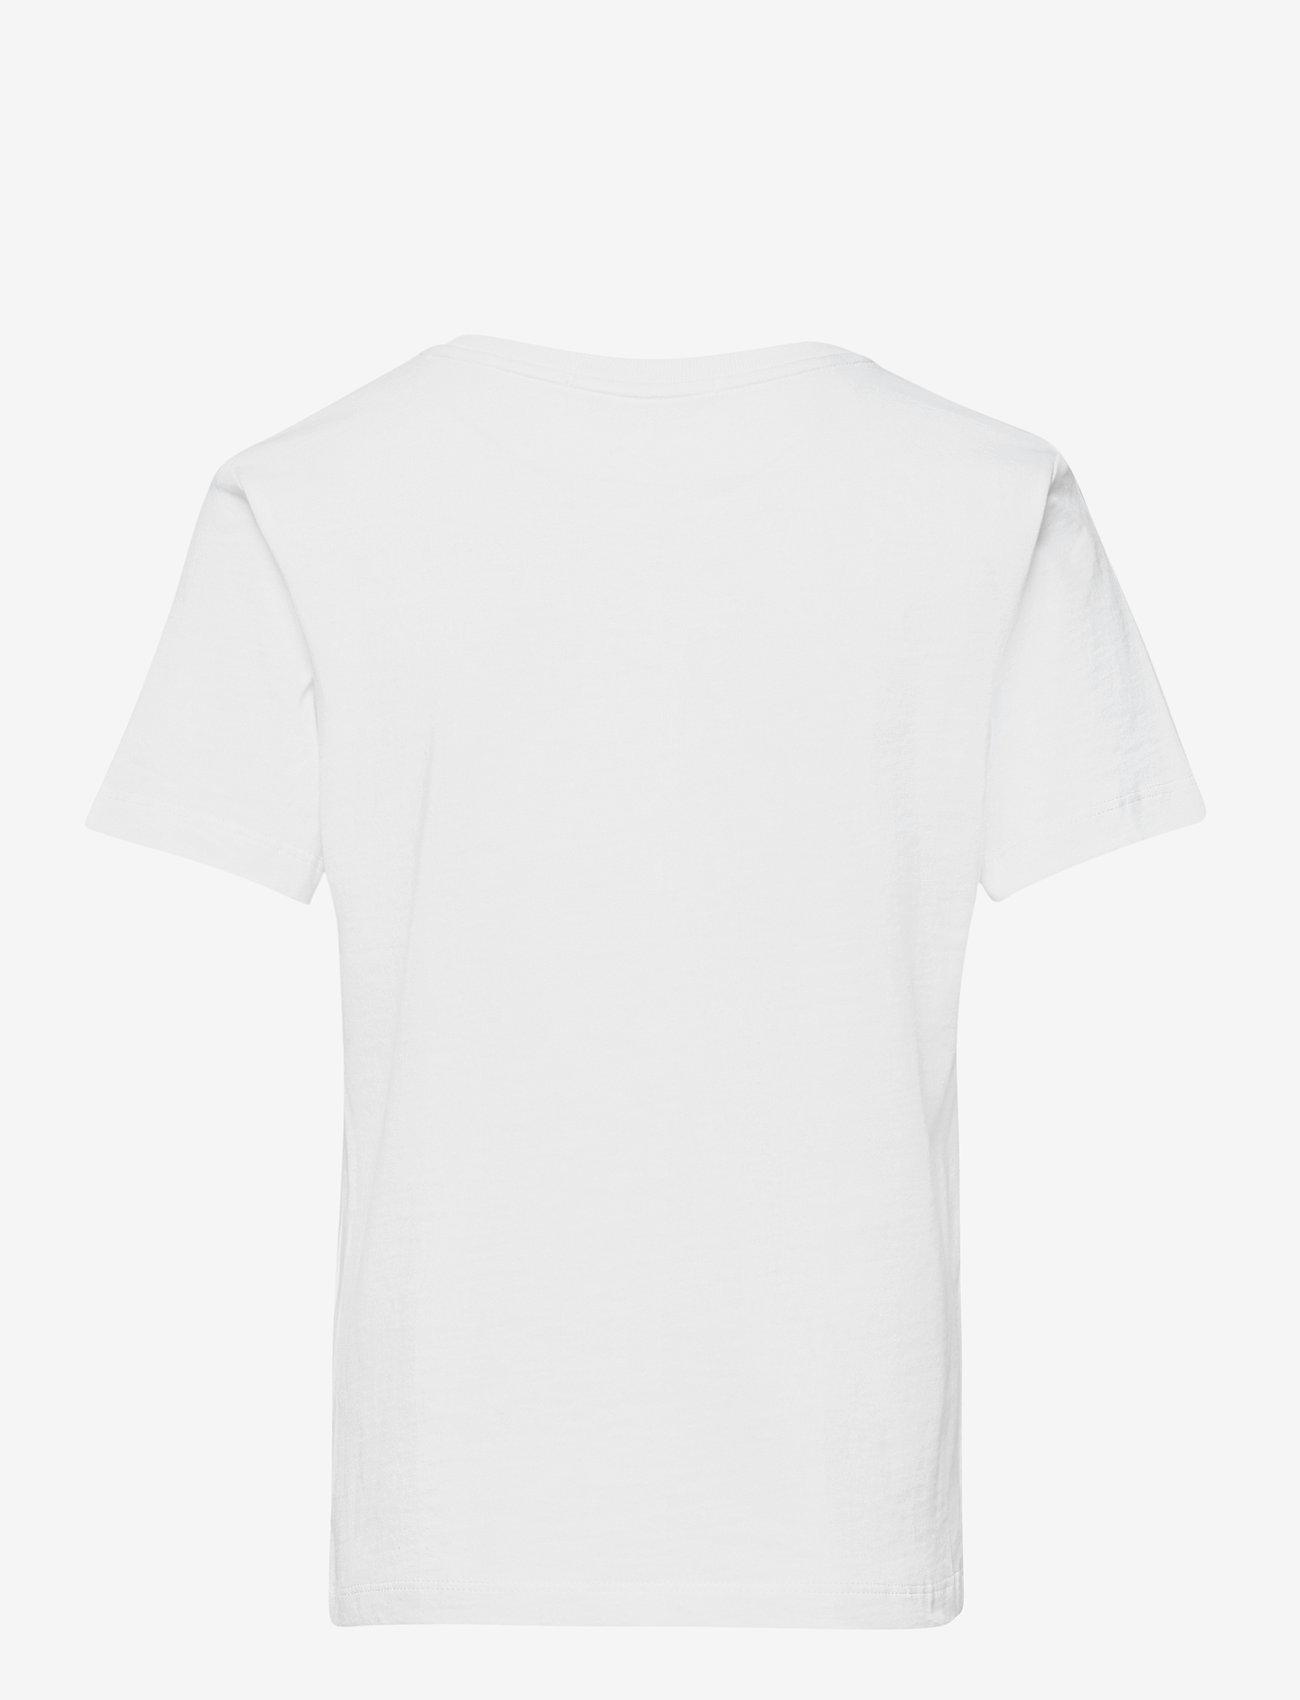 Calvin Klein - LOGO TAPE COLOUR BLOCK T-SHIRT - t-shirts - bright white - 1